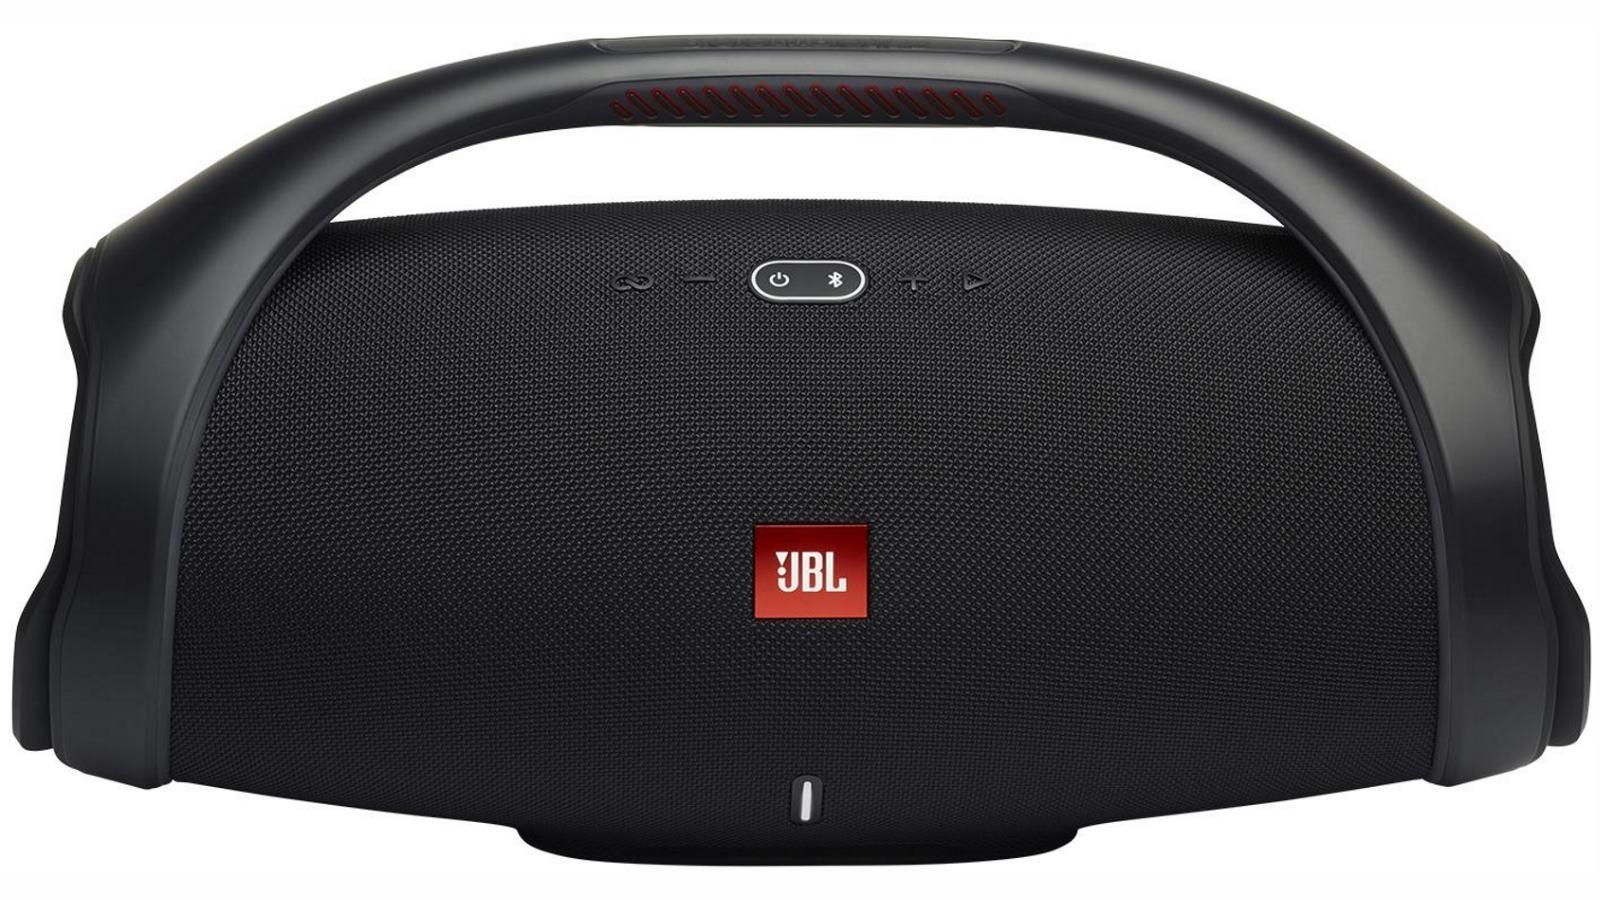 Hot Deals Jbl Boombox 2 Portable Bluetooth Speaker Black Harvey Norman Au